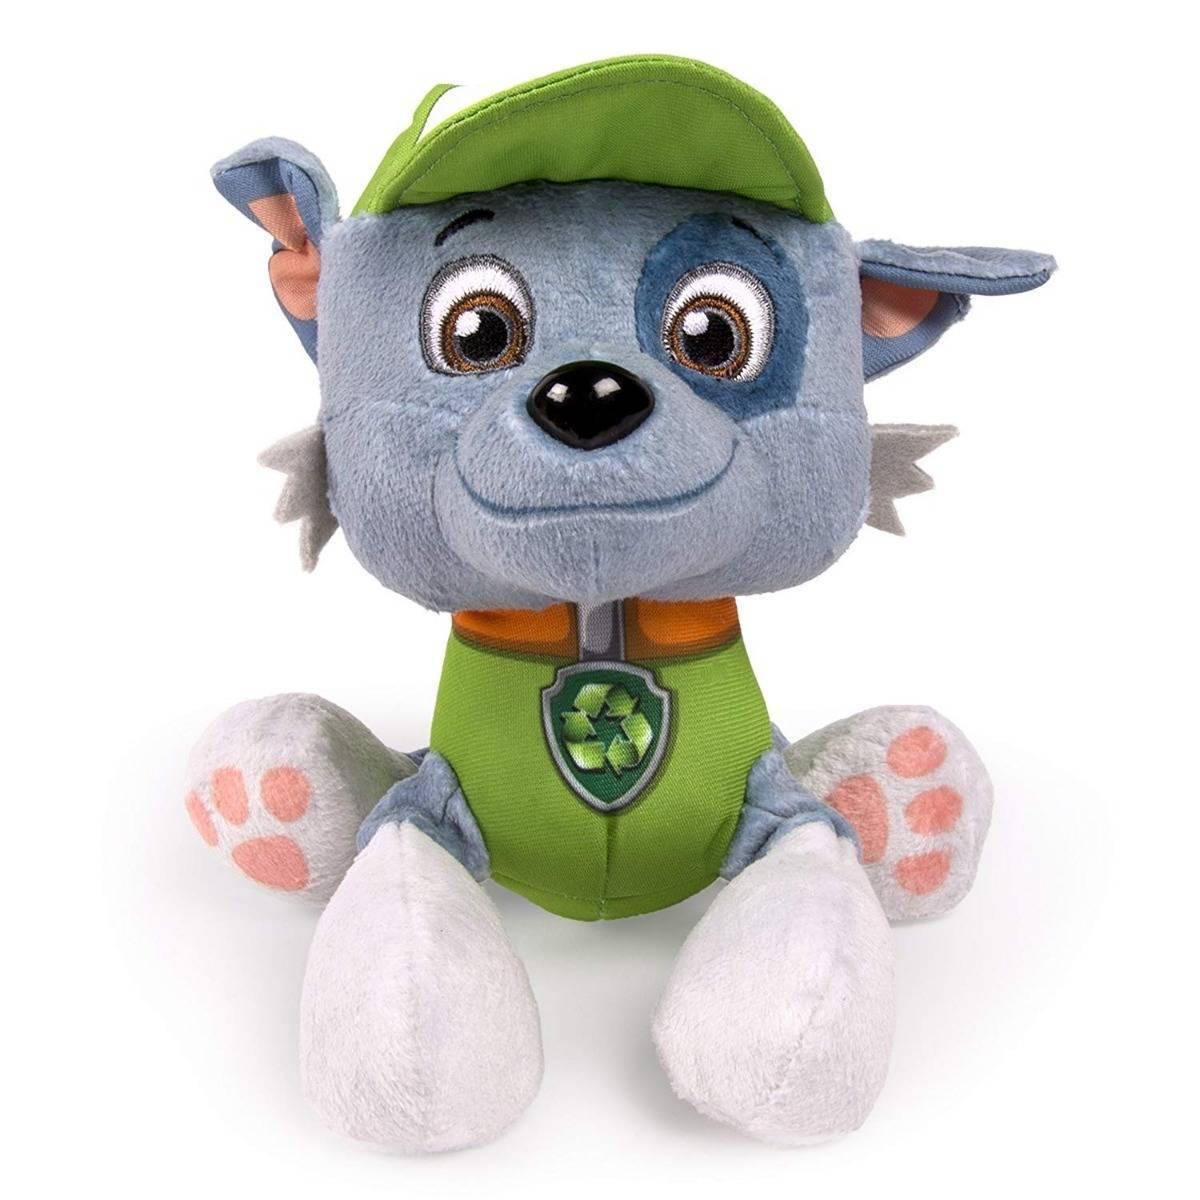 Pelúcia Rocky 15cm Patrulha Canina - Sunny 1326 - Noy Brinquedos